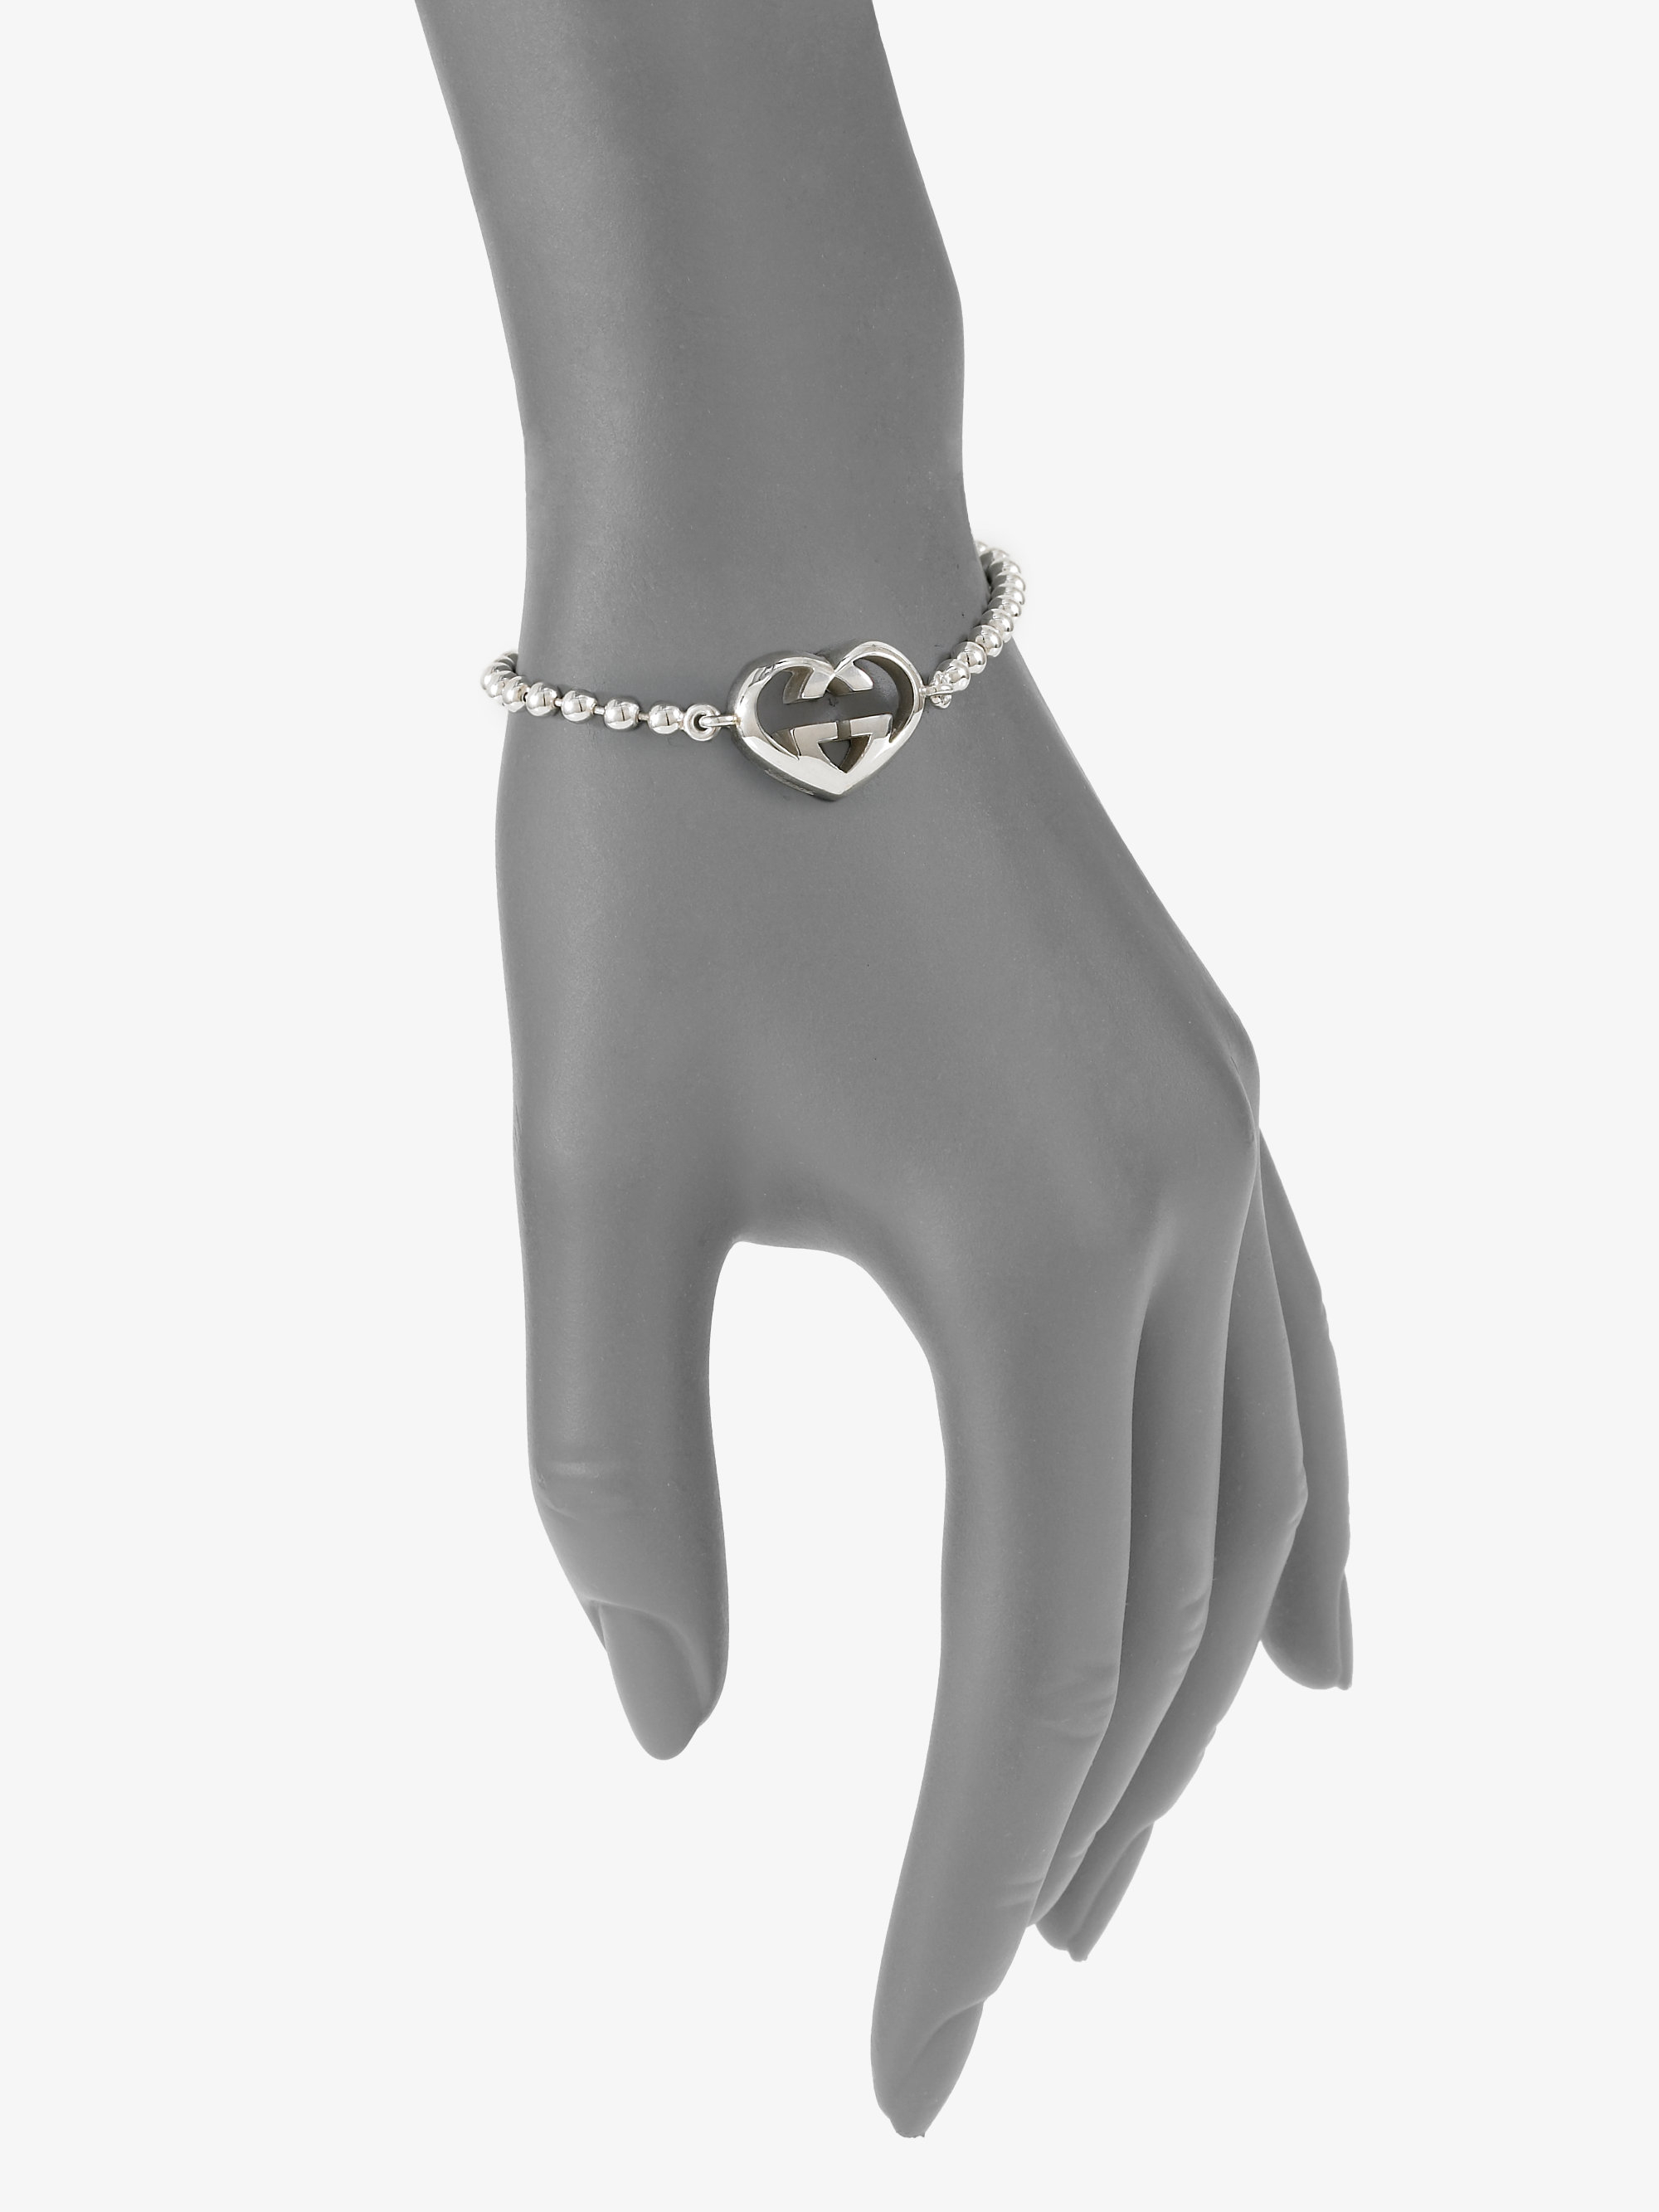 c579f77d6 Gucci Sterling Silver Love Britt Bracelet in Metallic - Lyst